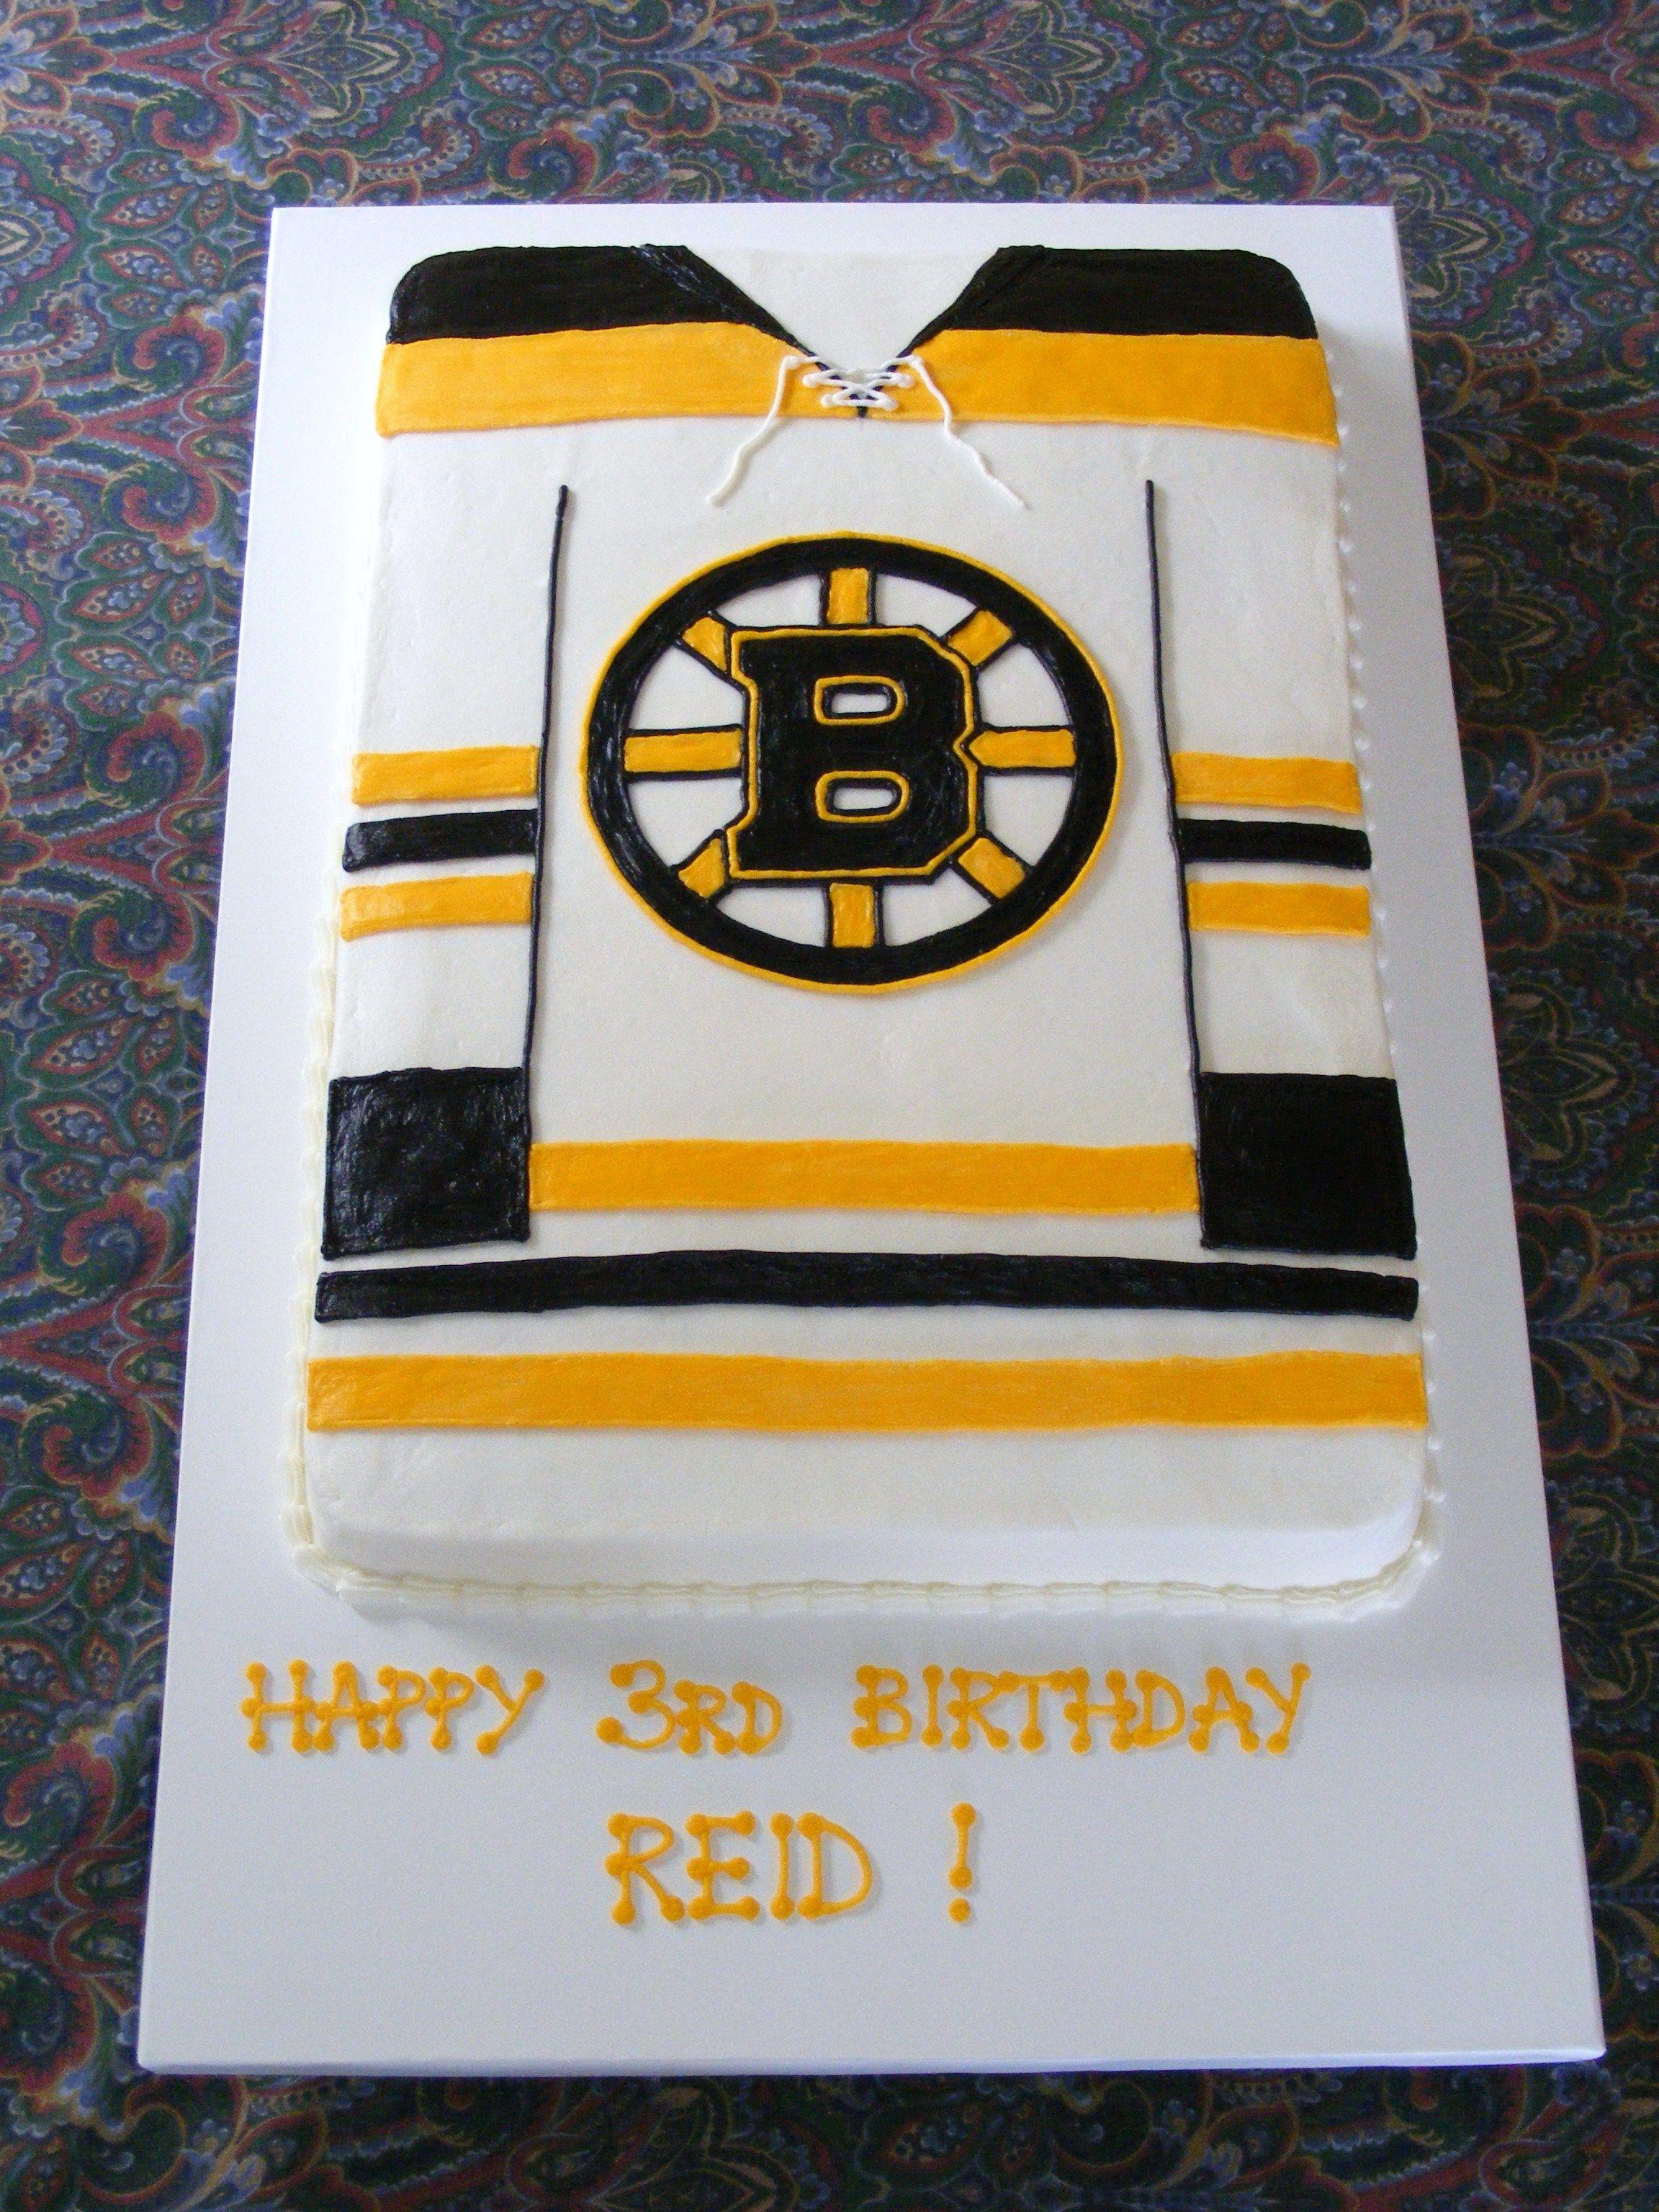 de3818a52b28da2c03fb3e49b43e6df7 pictures of hockey birthday cakes bruins birthday cake